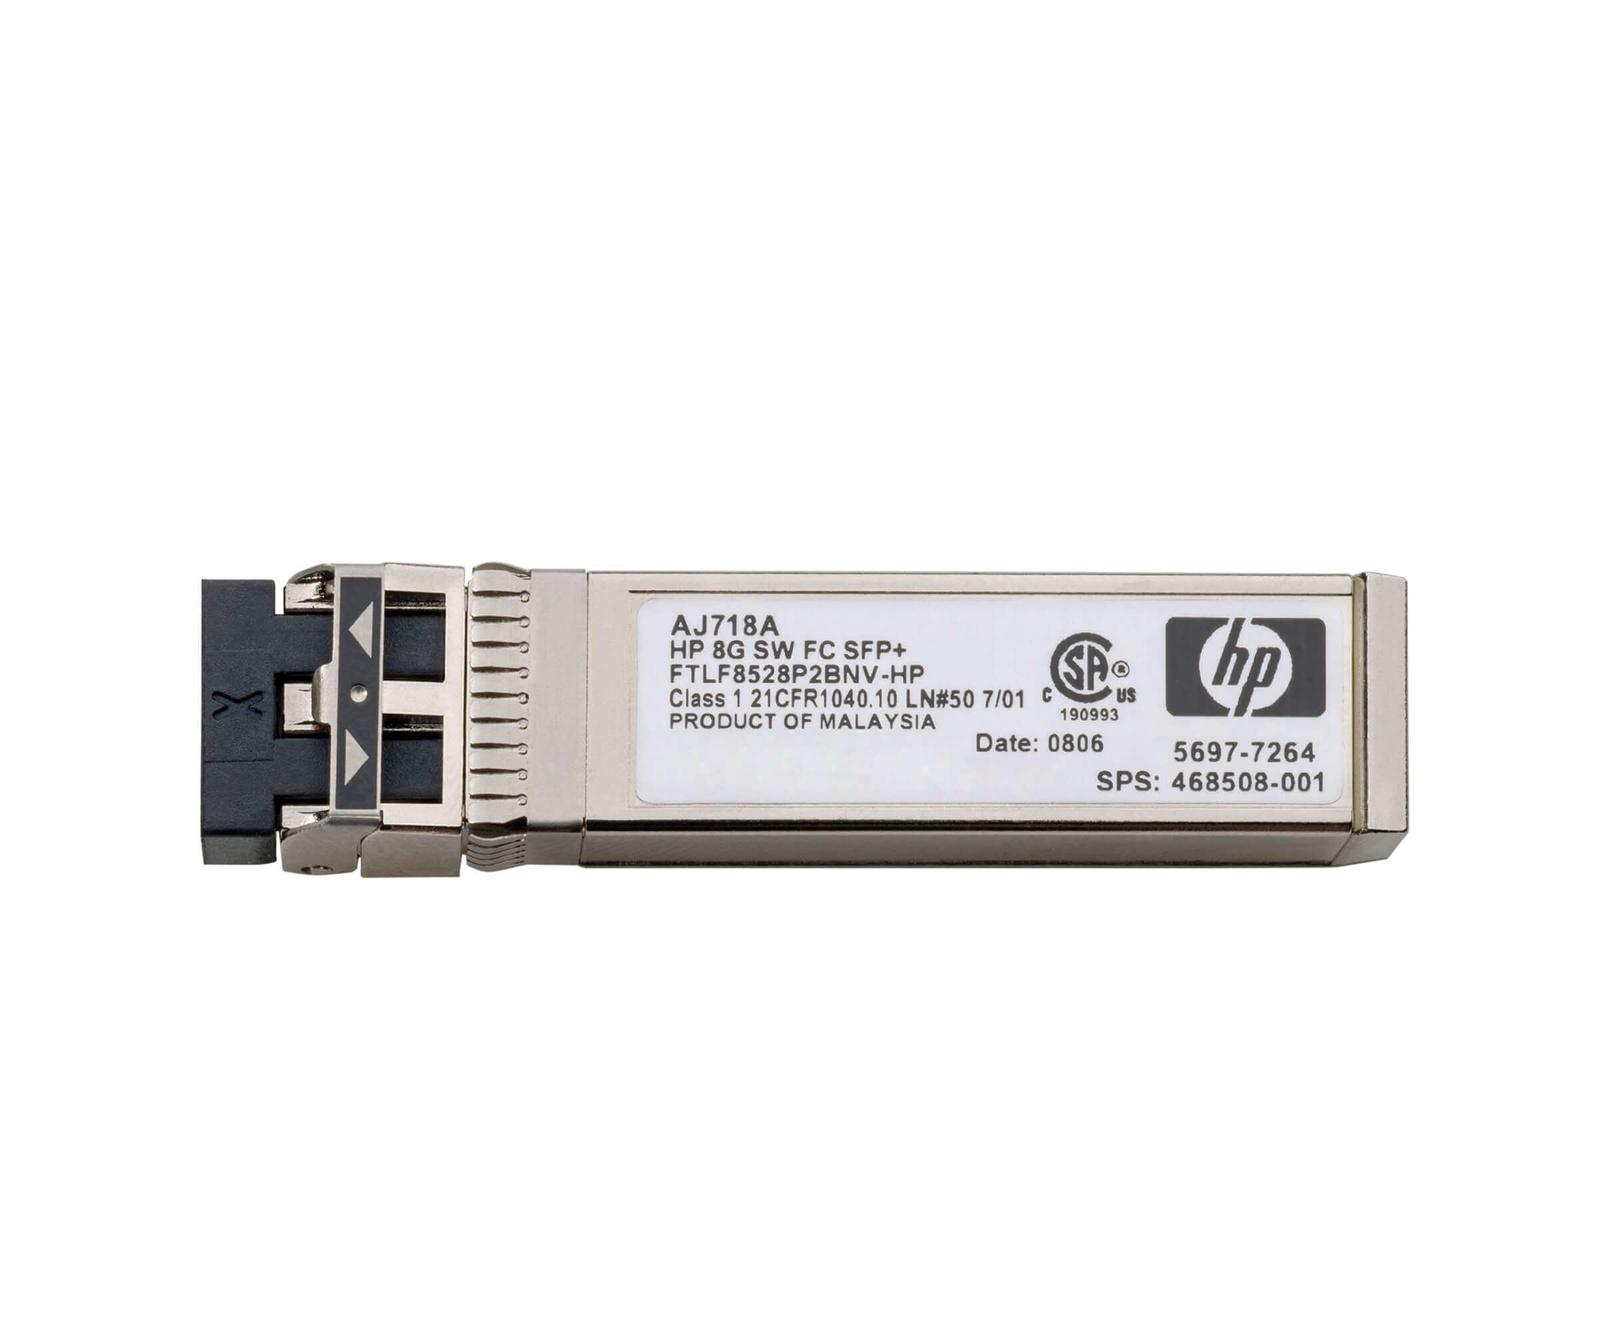 Трансивер HPE AJ718 ASFP+ 468508-001, 5697-7264 трансивер hp 8gb short wave transceiver kit 4 pk c8r23a c8r23a